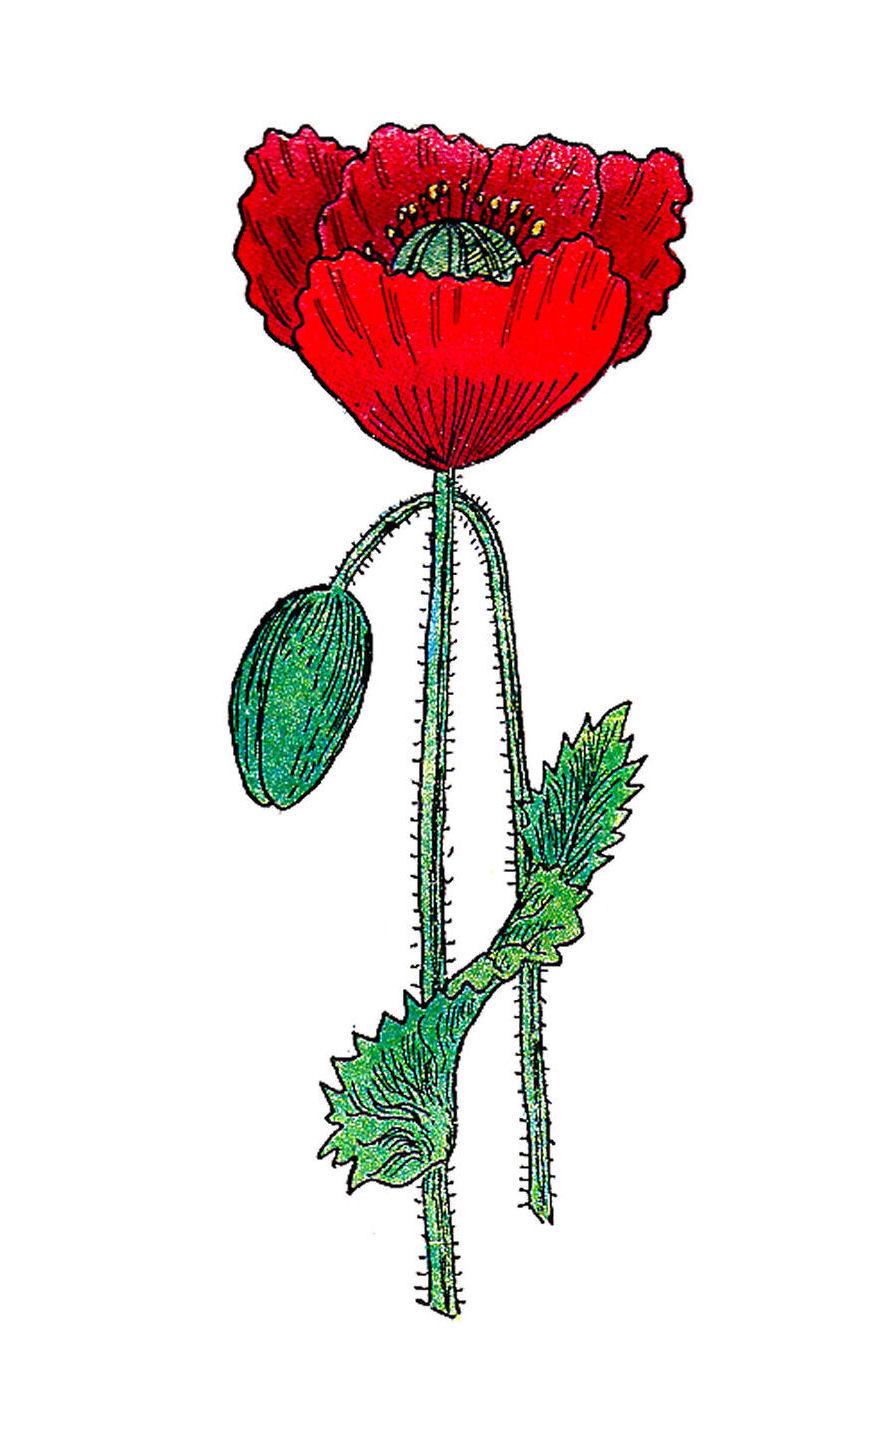 Antique images free botanical graphic vintage poppy flower free botanical graphic vintage poppy flower illustration from 1916 medical book mightylinksfo